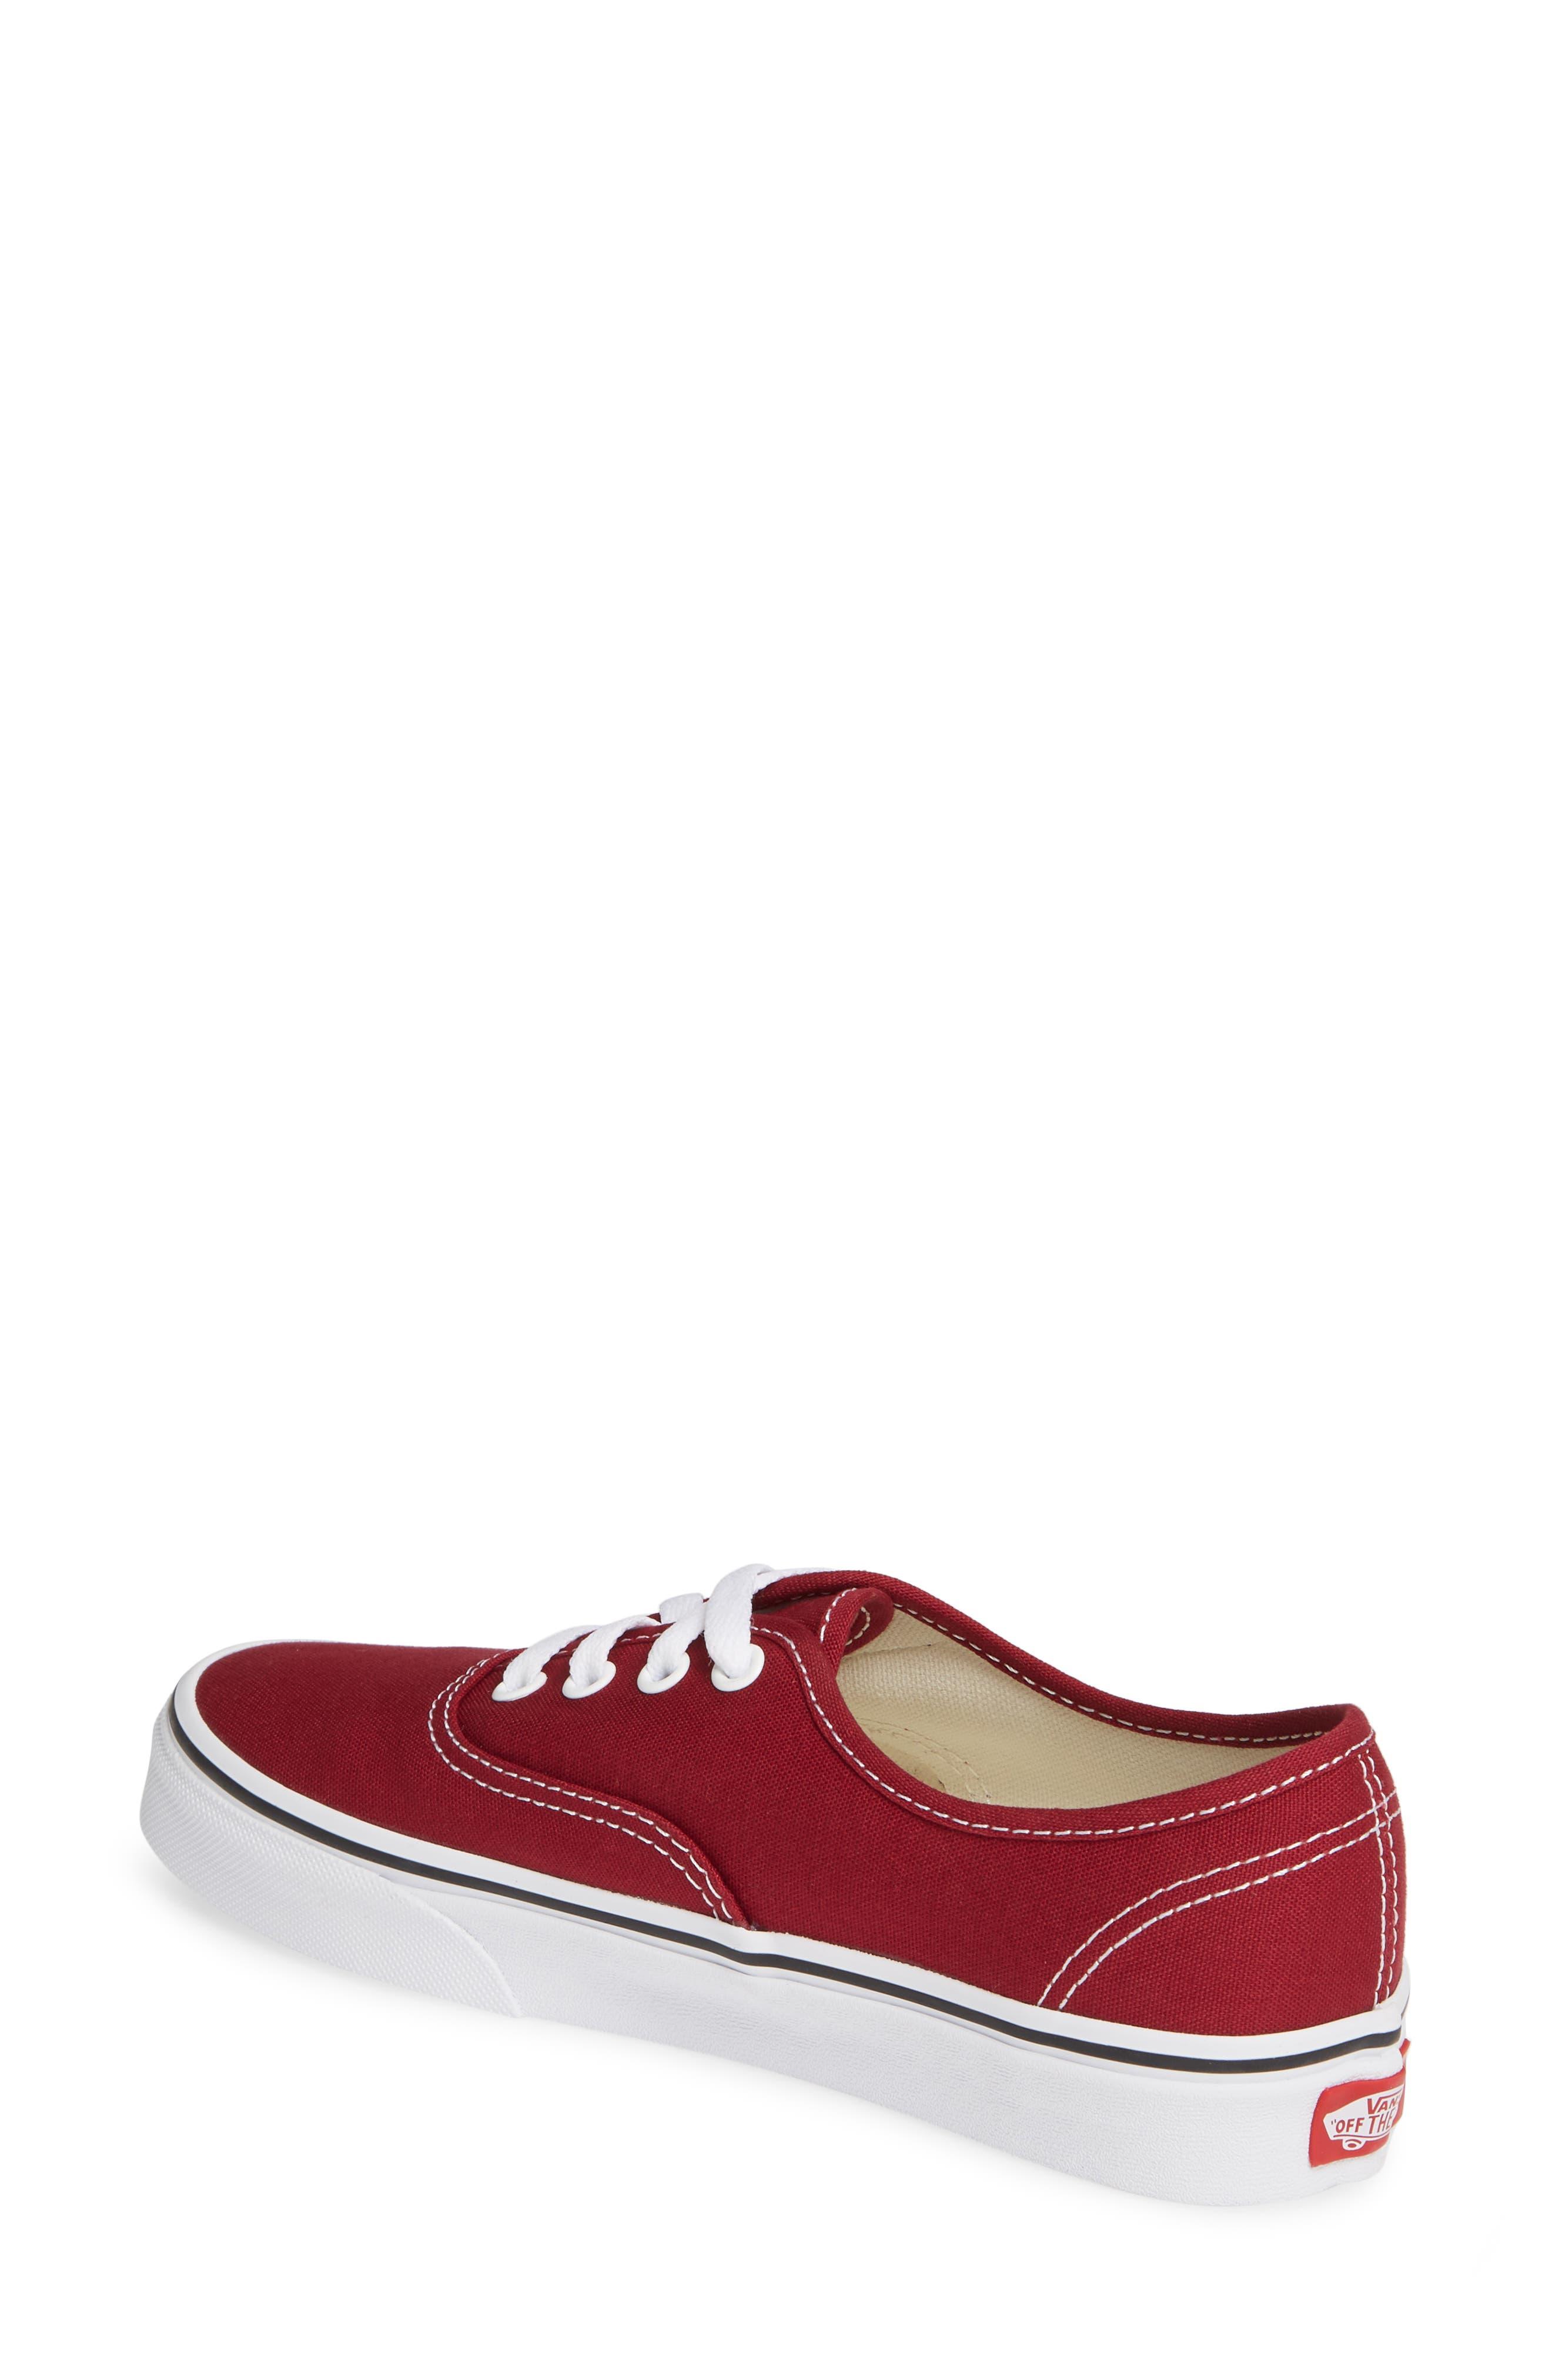 ,                             'Authentic' Sneaker,                             Alternate thumbnail 515, color,                             932